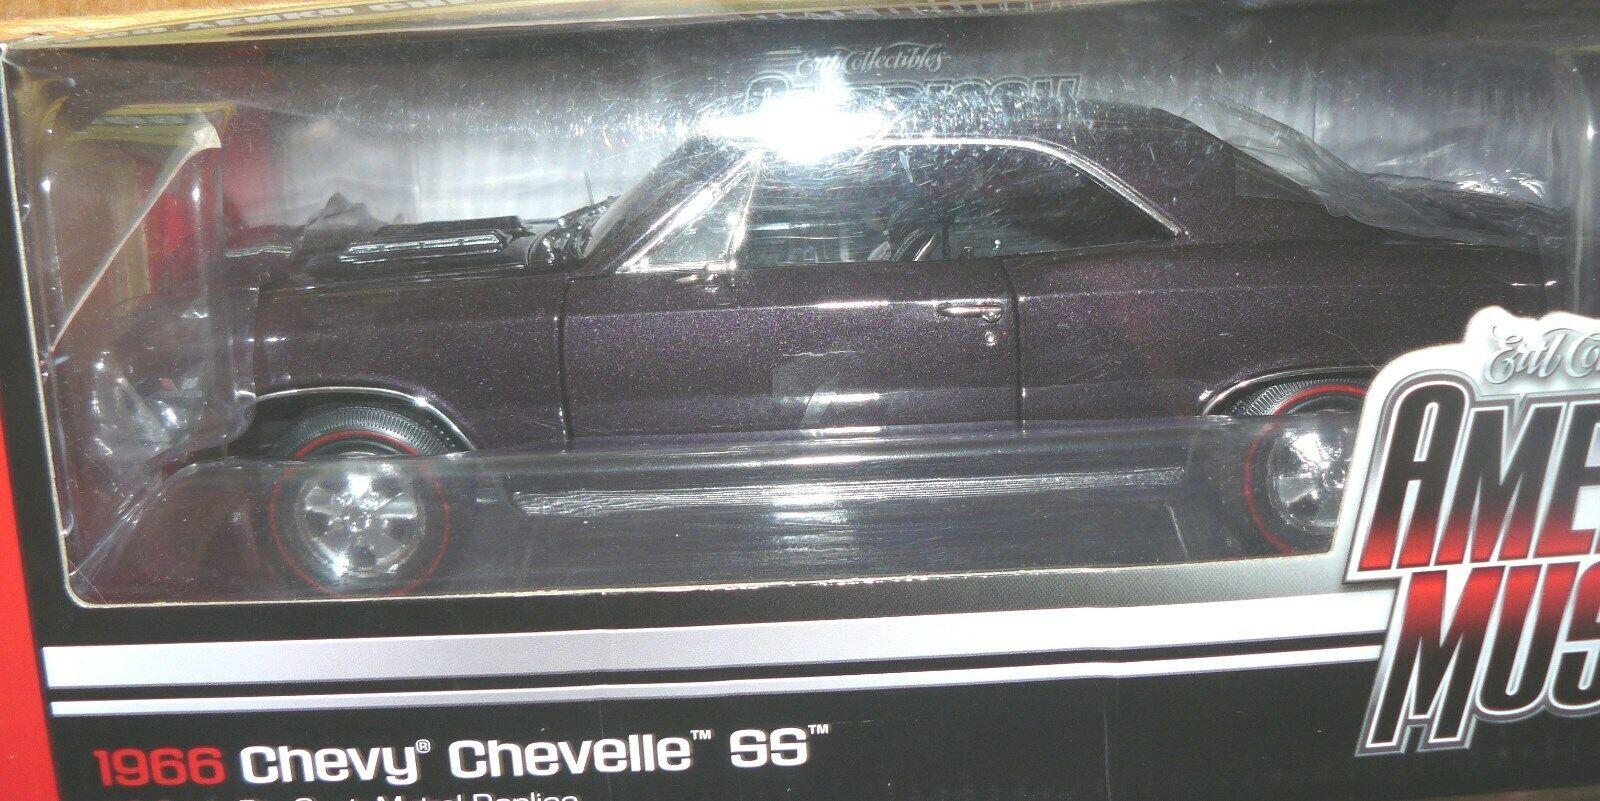 1 18  1966 Chevelle plum mist , missing 1 headlight lens , hardly noticeable